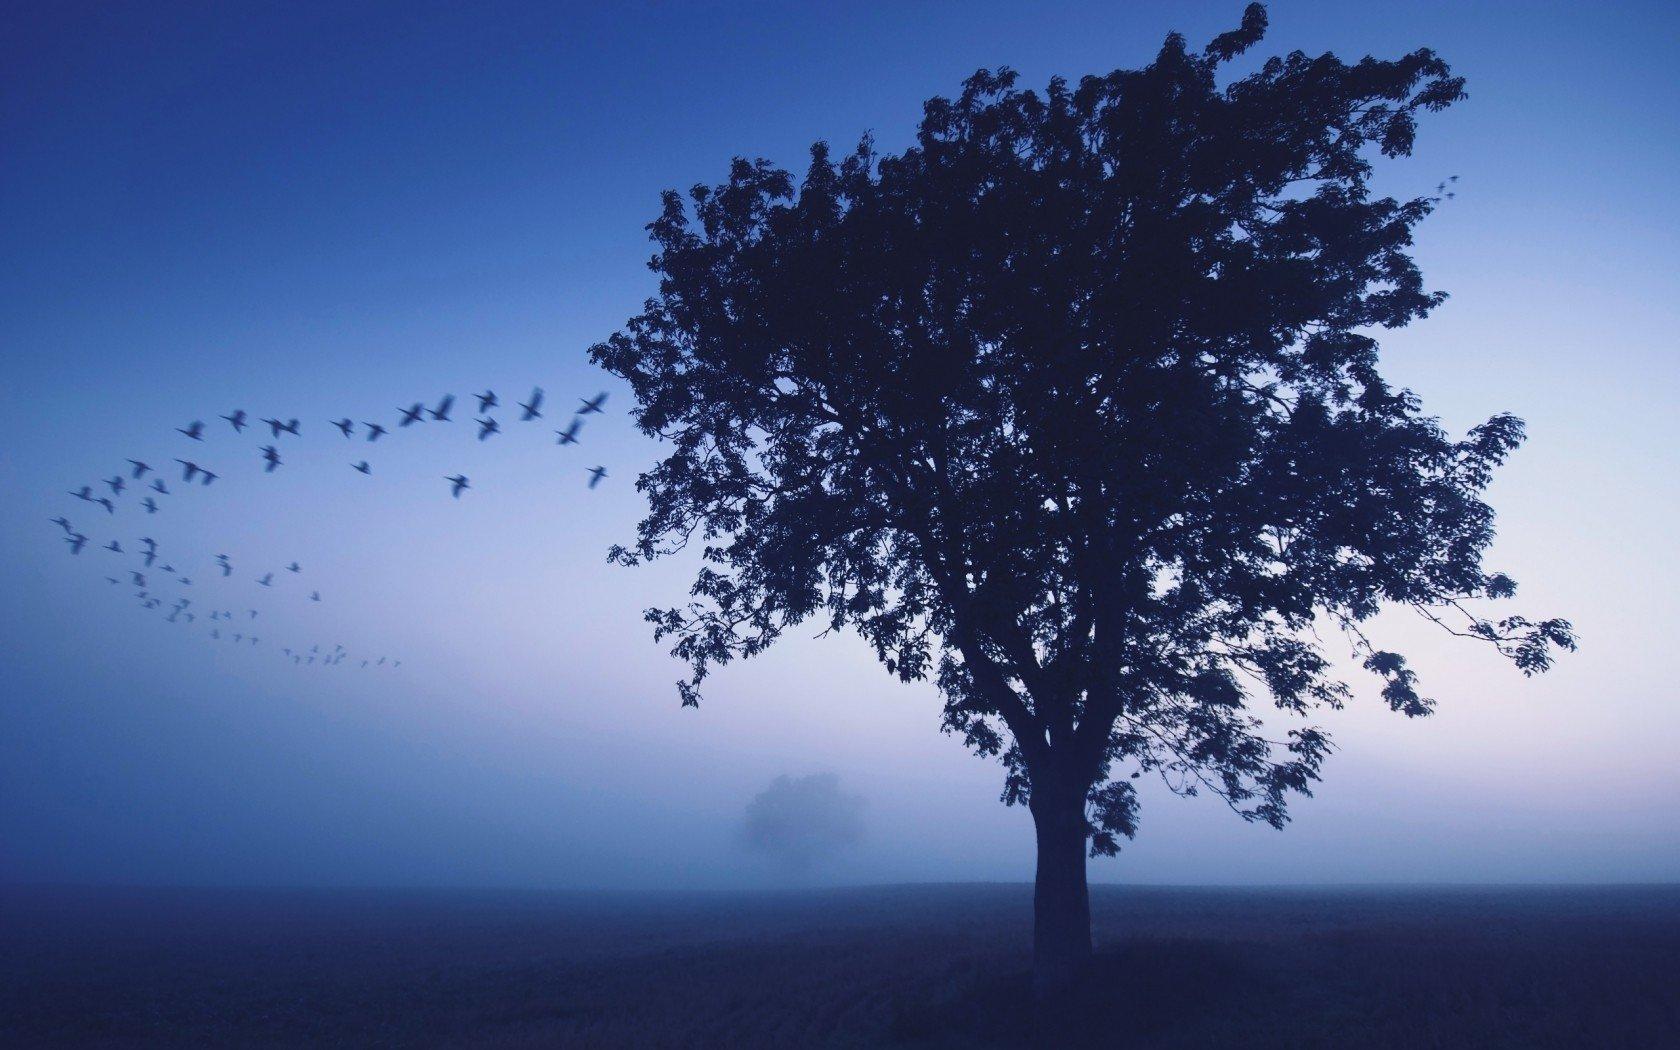 Blue Landscapes Nature Dark Birds Lonely Evening Shades Sky